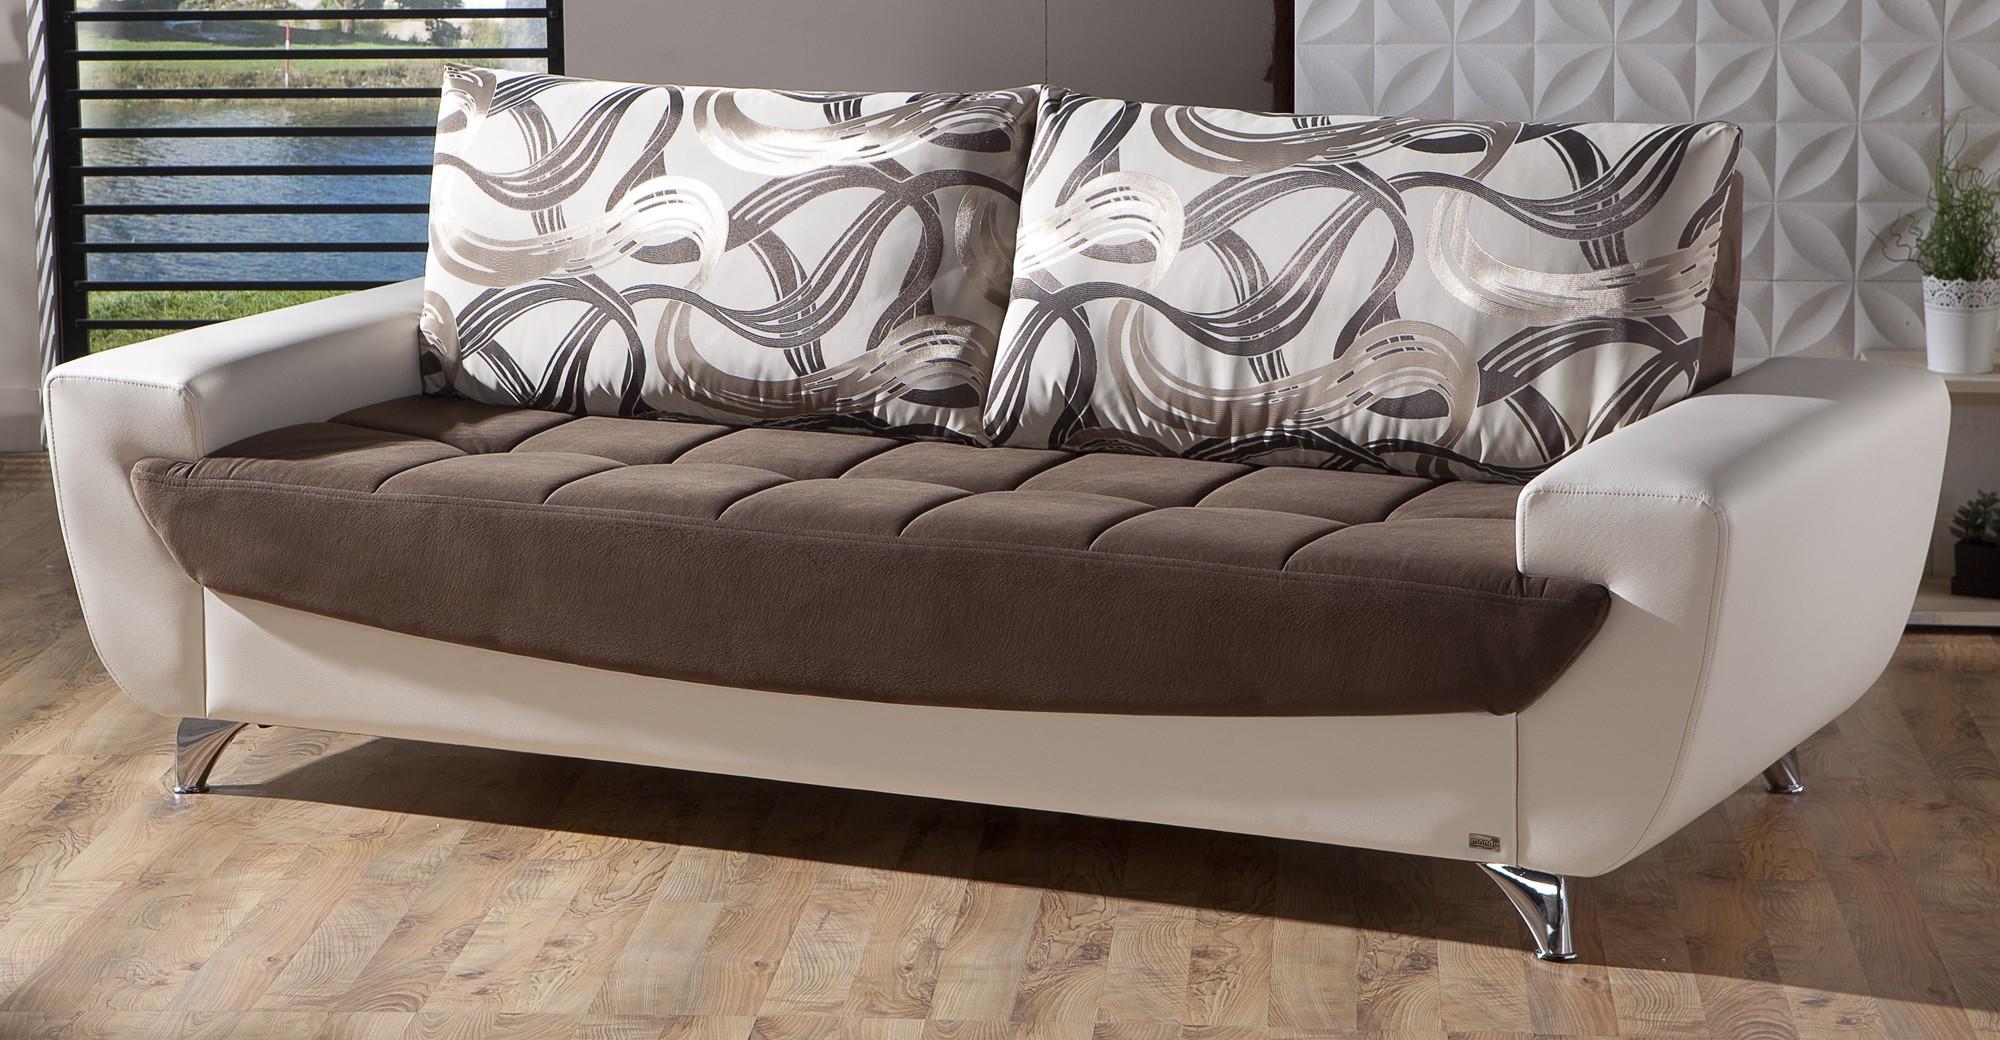 Legro 3 Seat Sleeper Best Brown By Sunset Buy From Nova